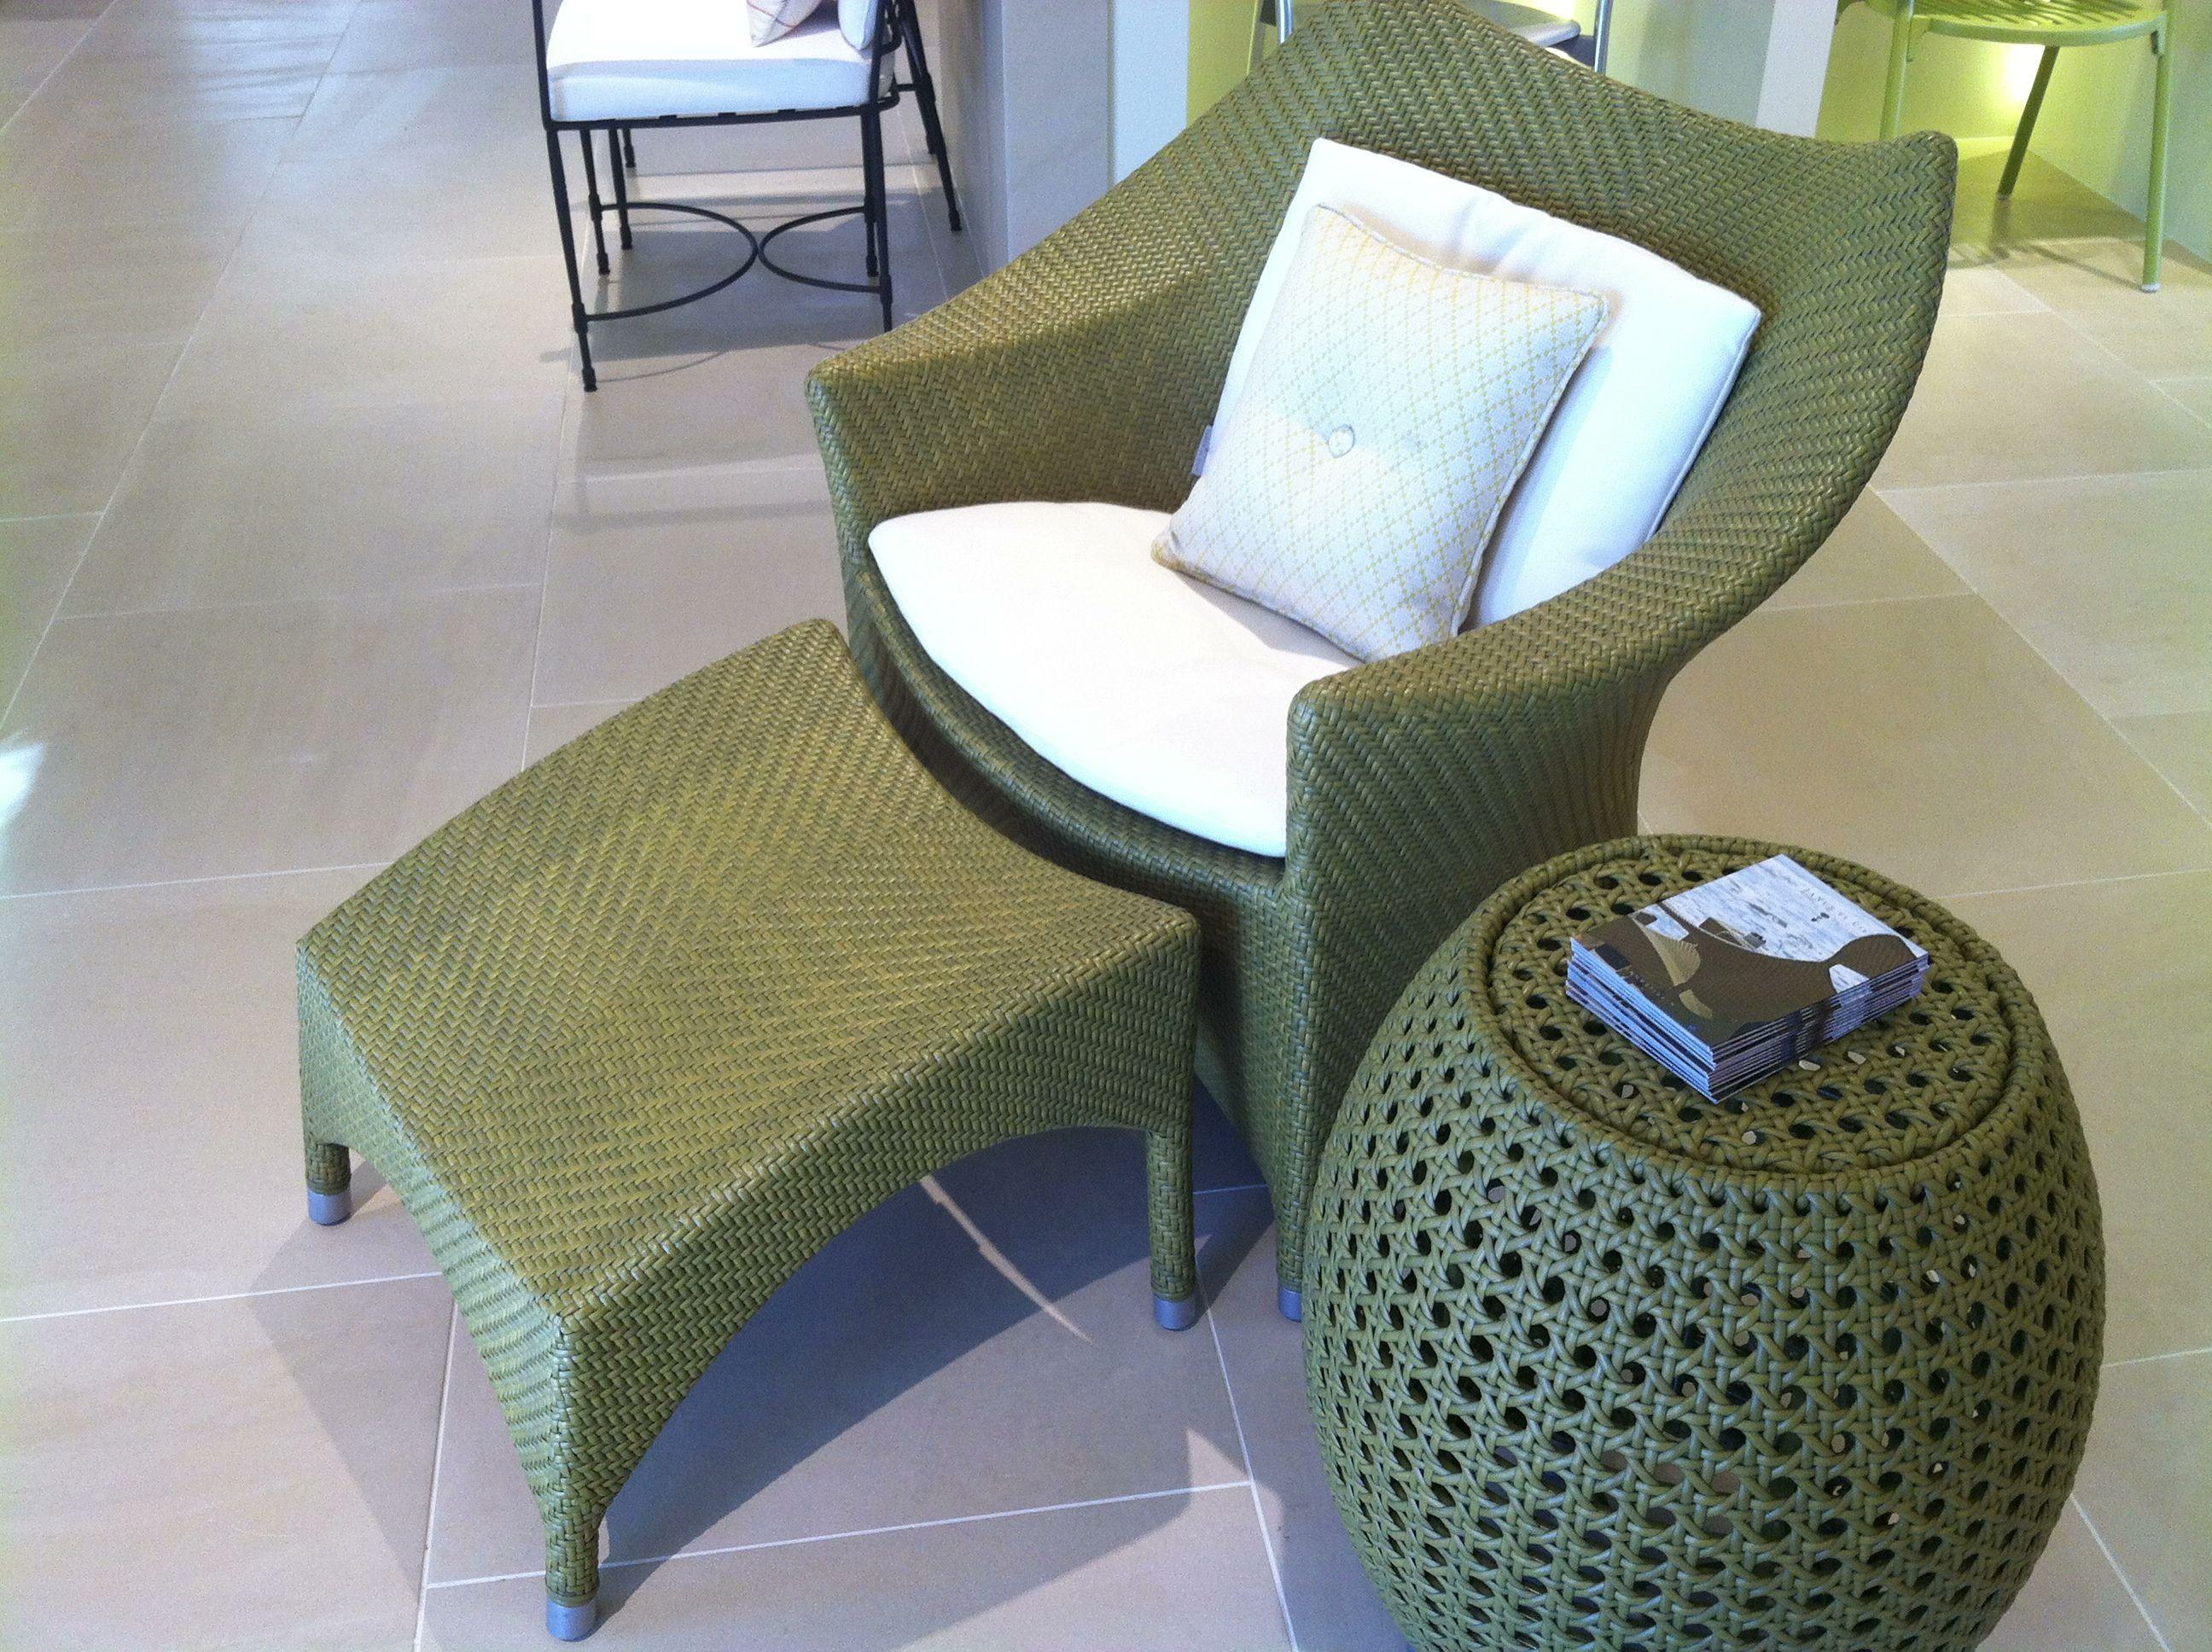 janus et cieatlantaamari lounge chair so comfortable and fun in  - janus et cieatlantaamari lounge chair so comfortable and fun in this